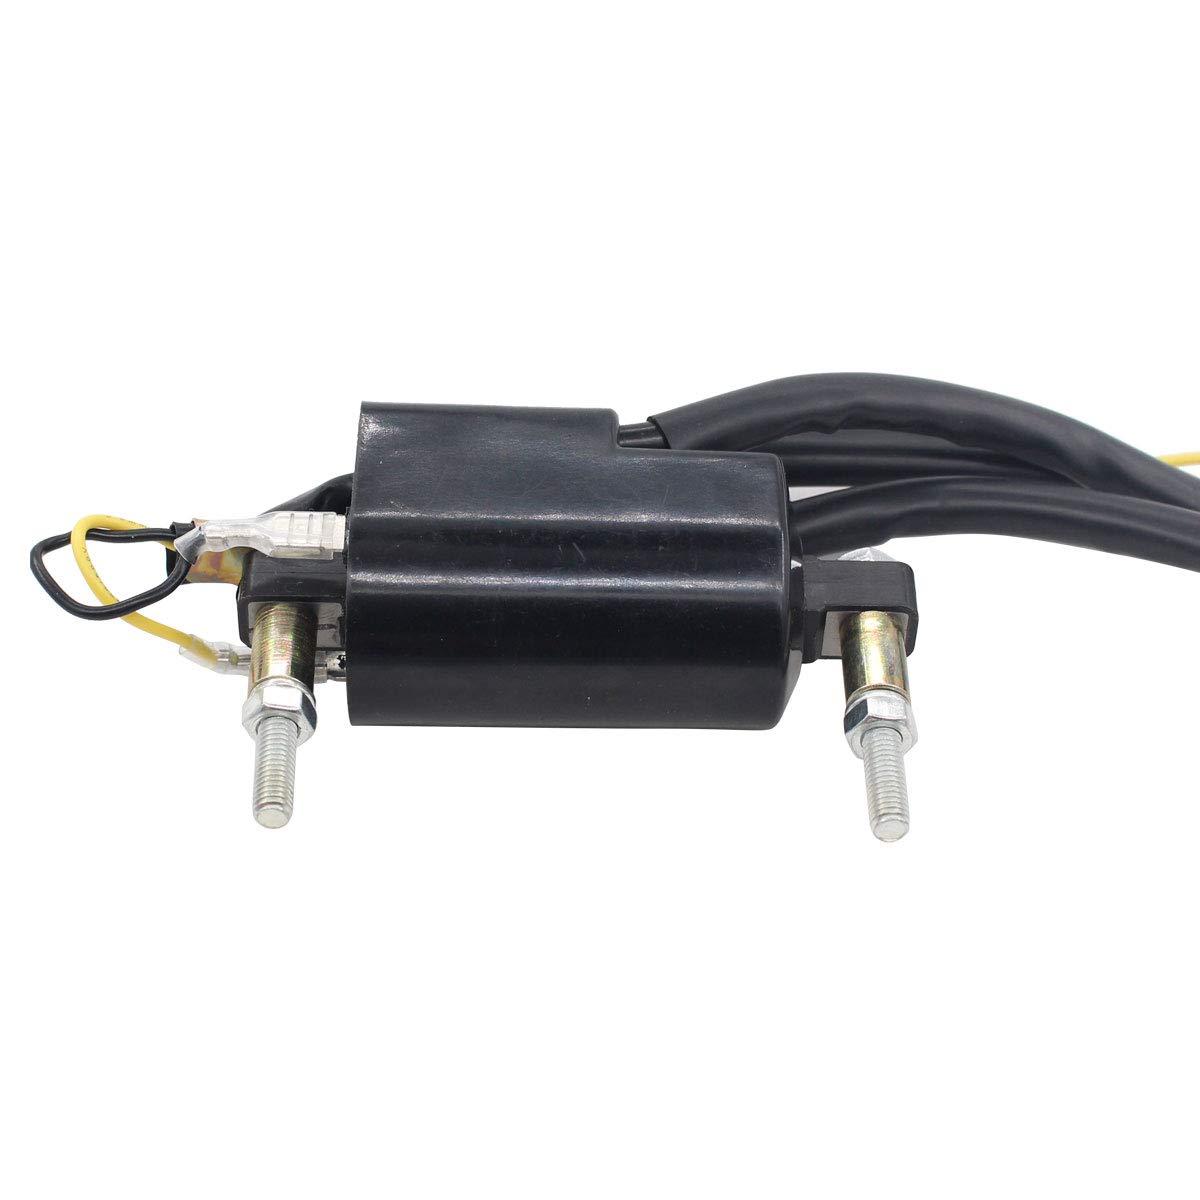 MOTOKU Pack of 2 12V Ignition Coil for Suzuki GSXR750 GSXR600 GS1100 GS750 Bandit 1200 Kawasaki Zephyr ZR550B ZZR1200 ZZR600 ZRX1100 Z1000